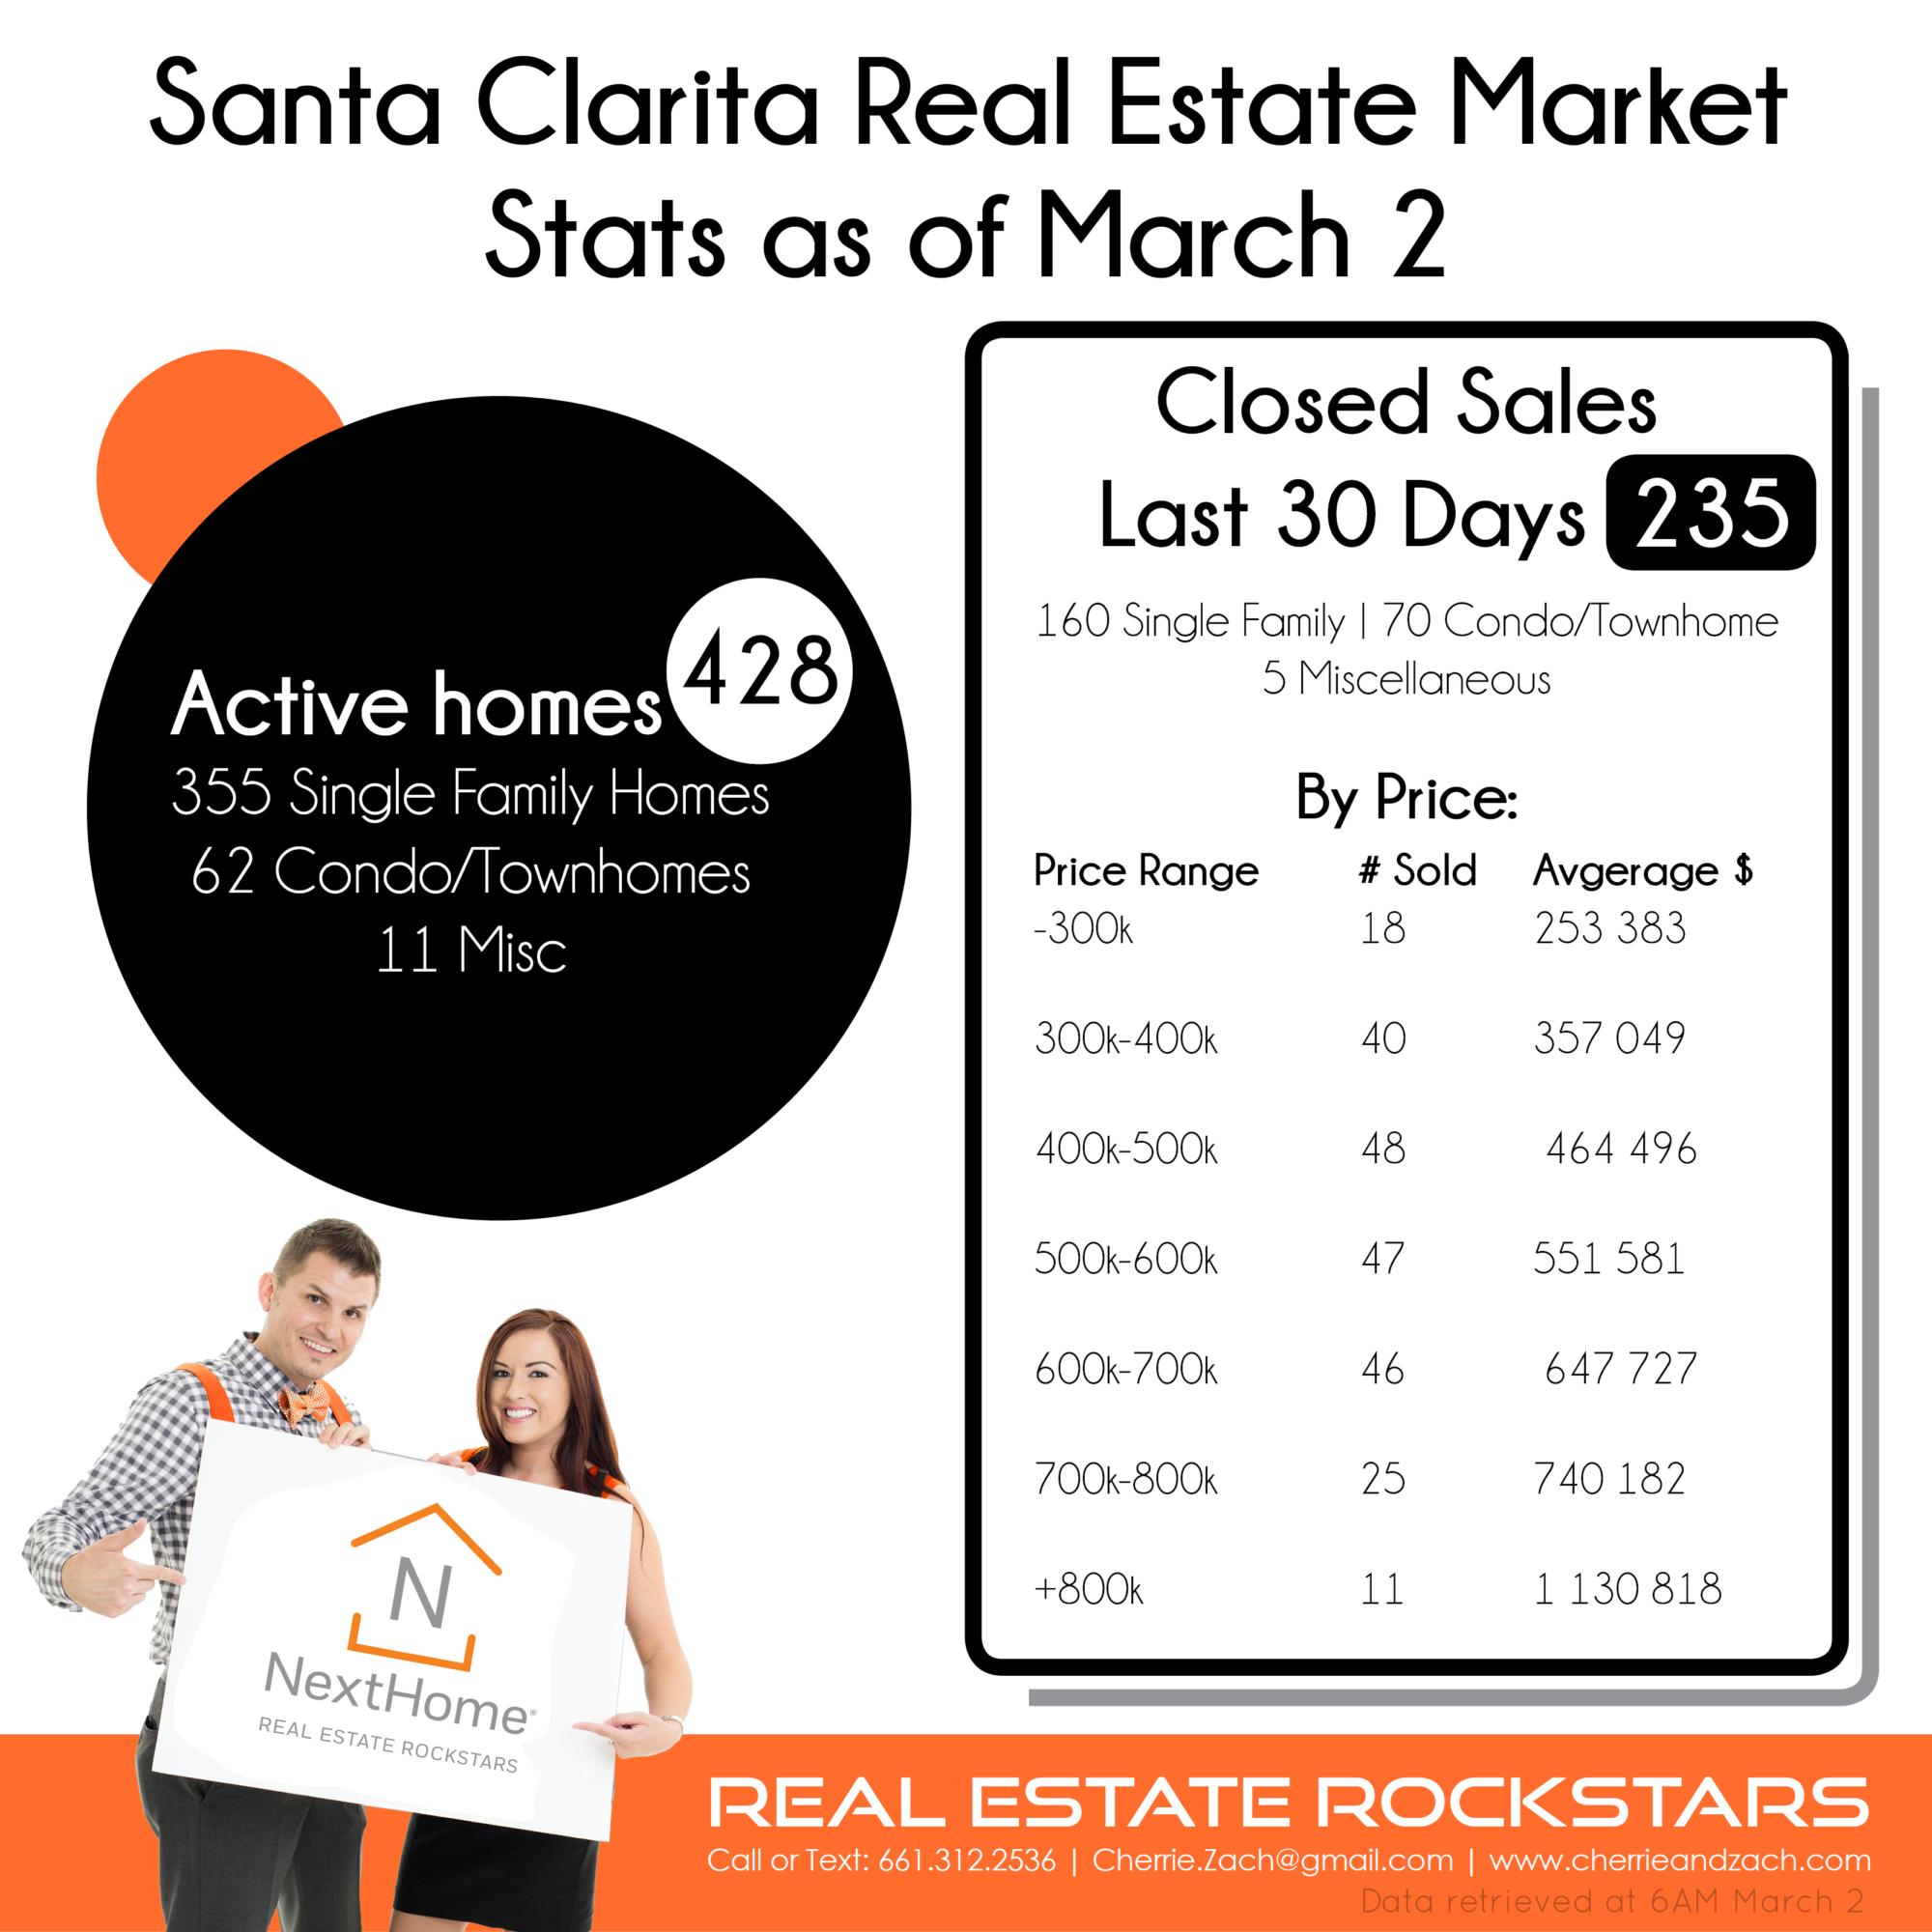 Cherrie-Zach-Real-Estate-Rockstars-NextHome-Santa-Clarita-Valencia-Statistics-March-2018.png